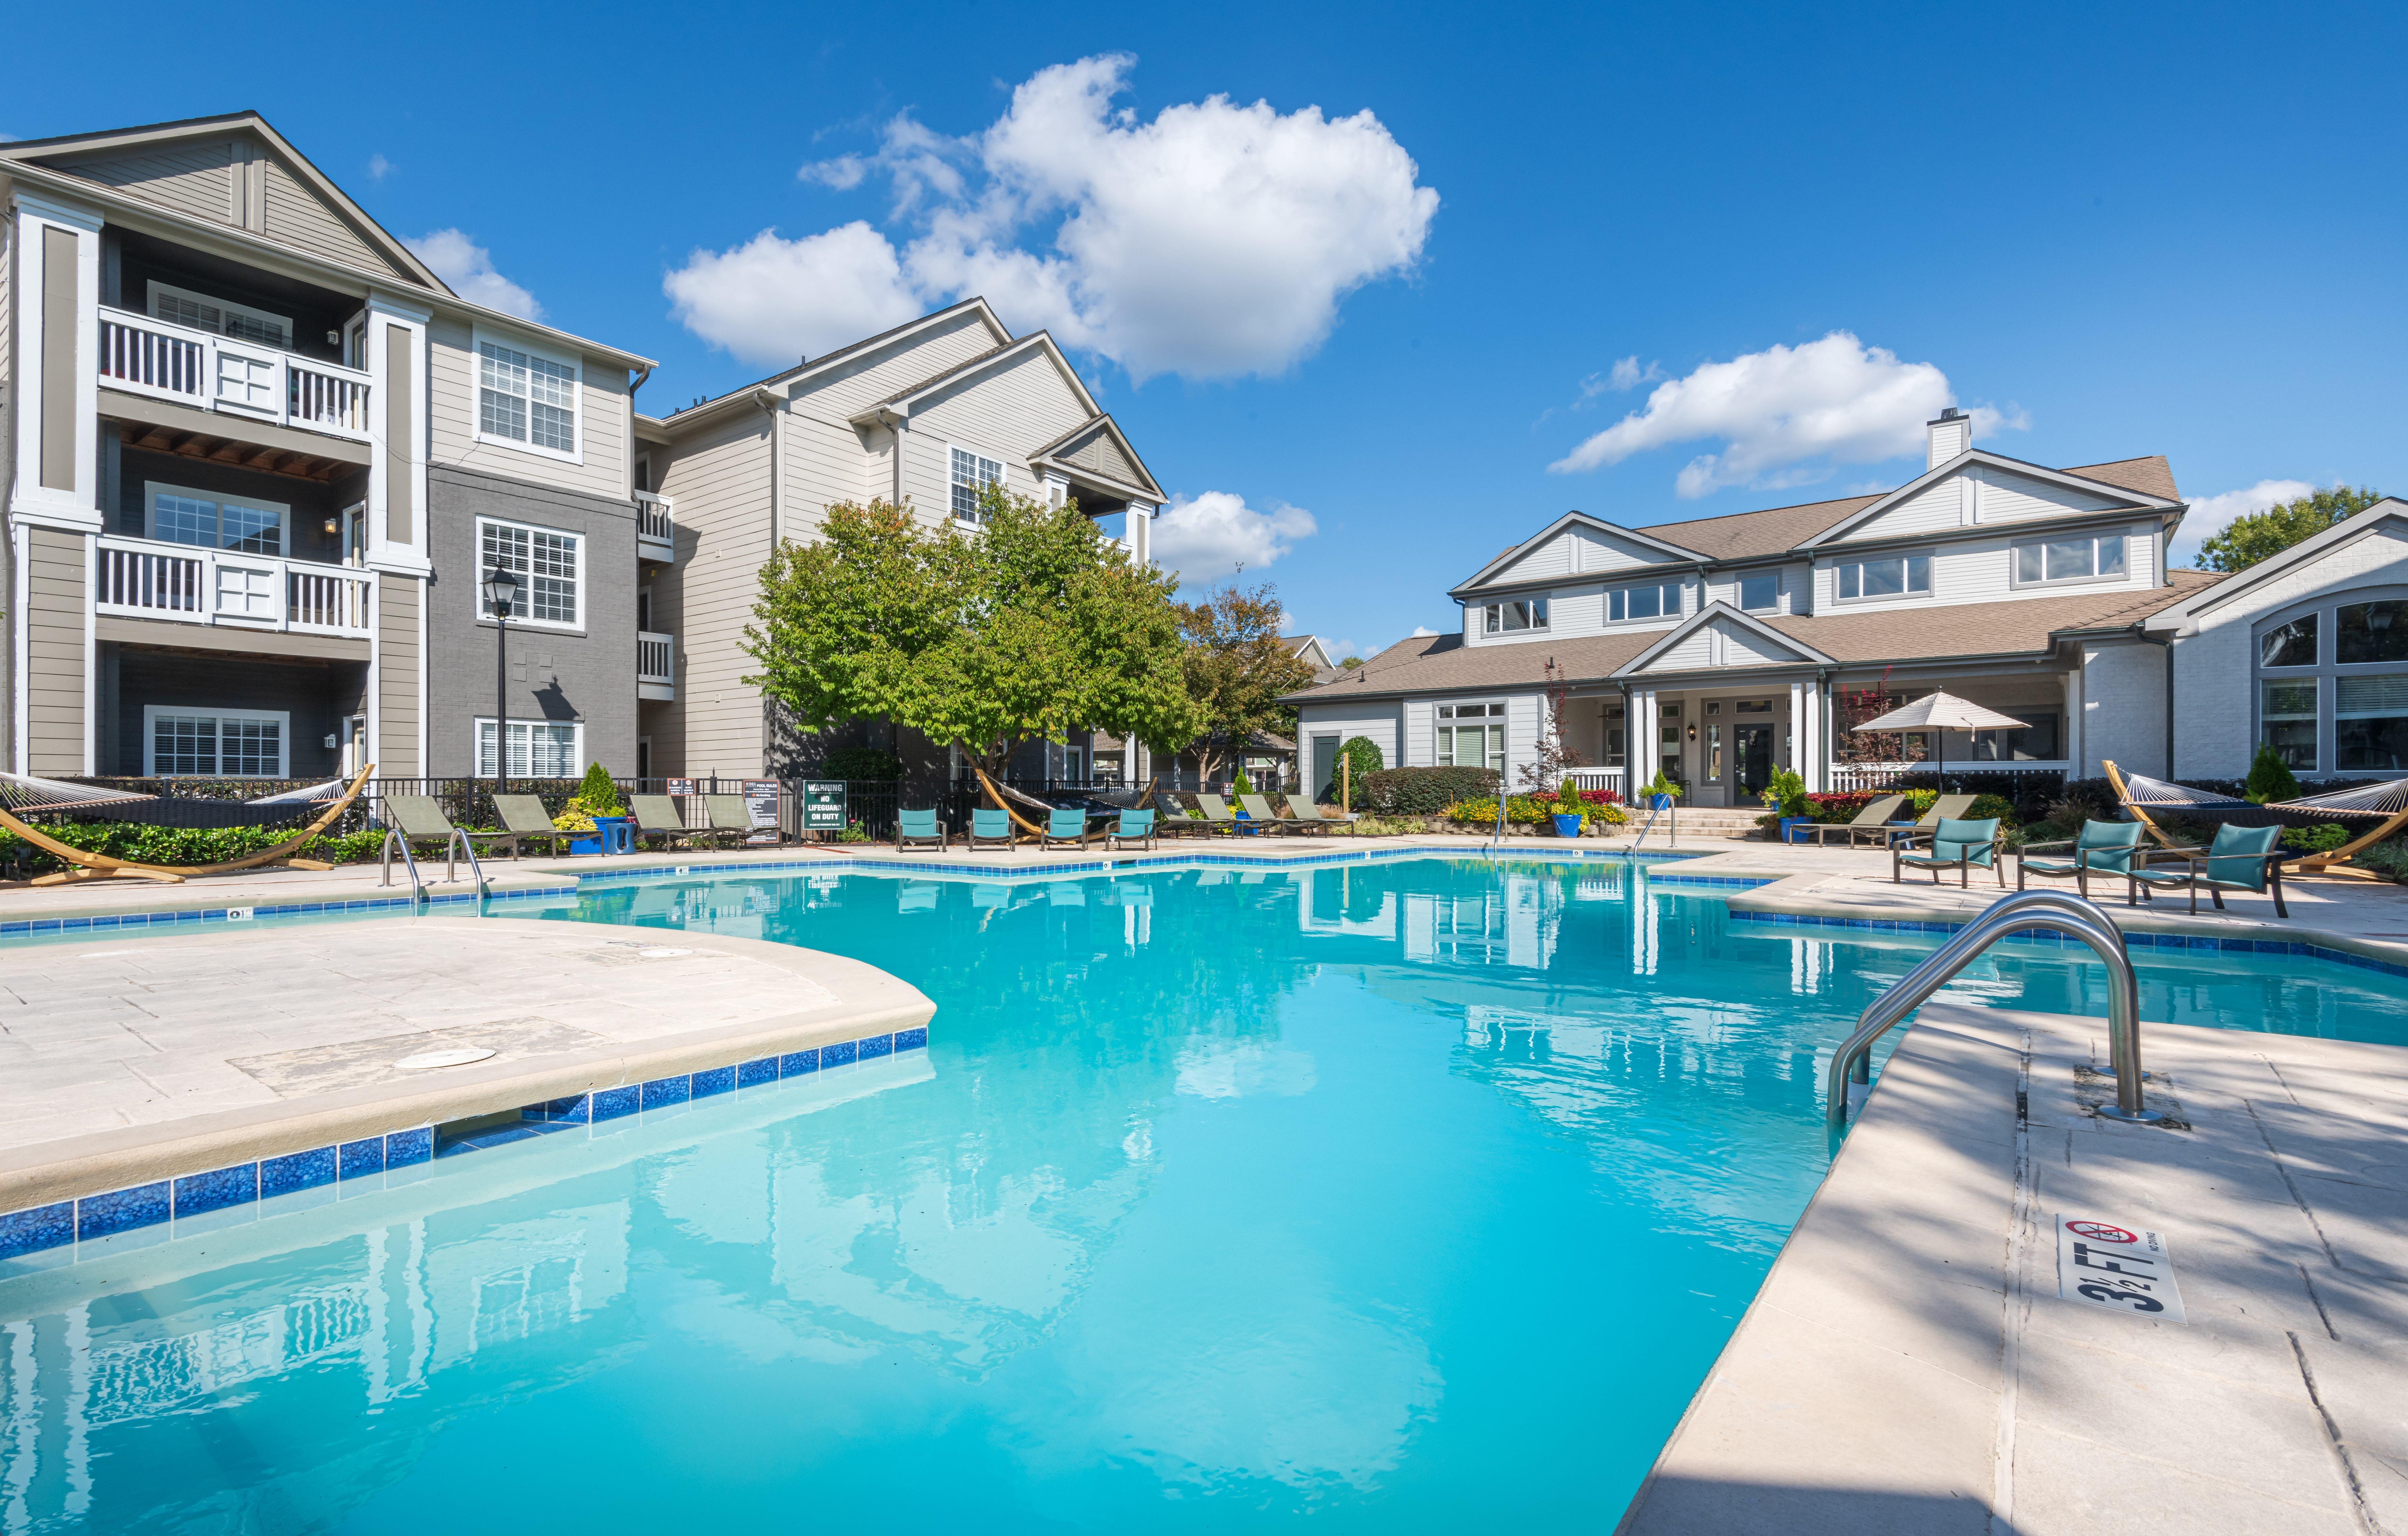 Sparkling Swimming Pool at 501 Estates apartment homes in Durham, NC